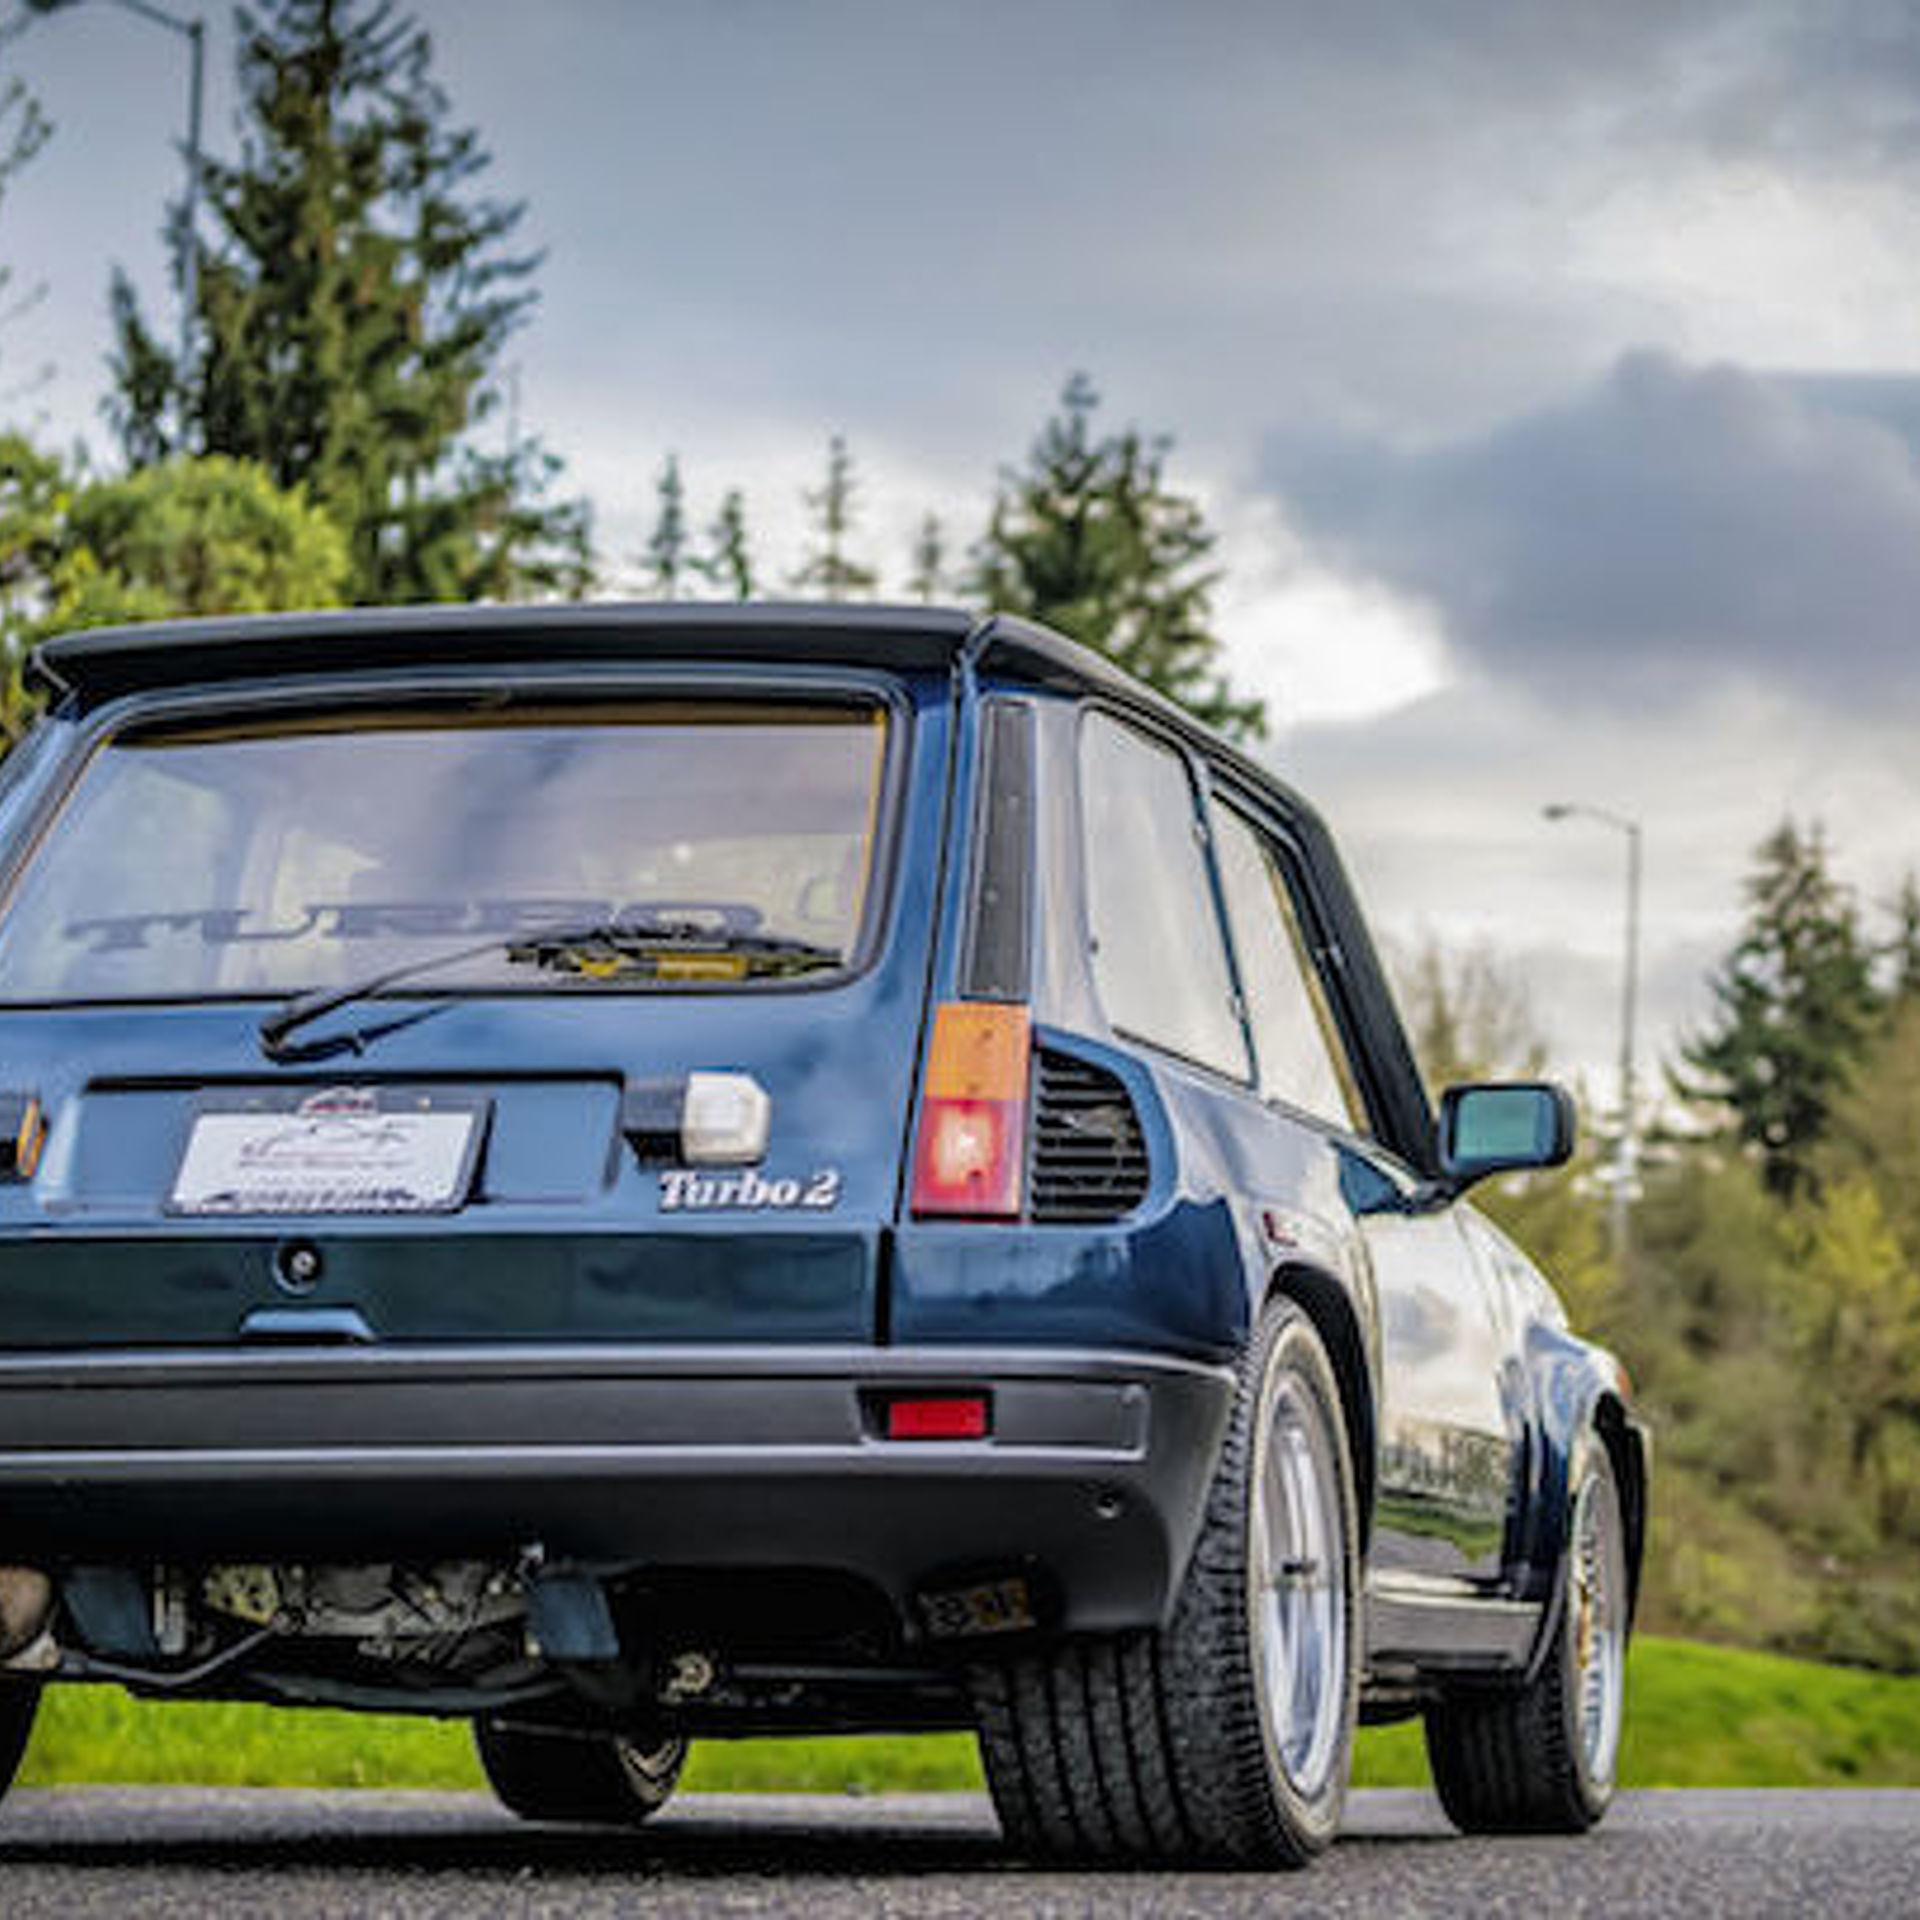 Renault R5 Turbo: Handsome Renault R5 Turbo II Seeks Its Second Owner